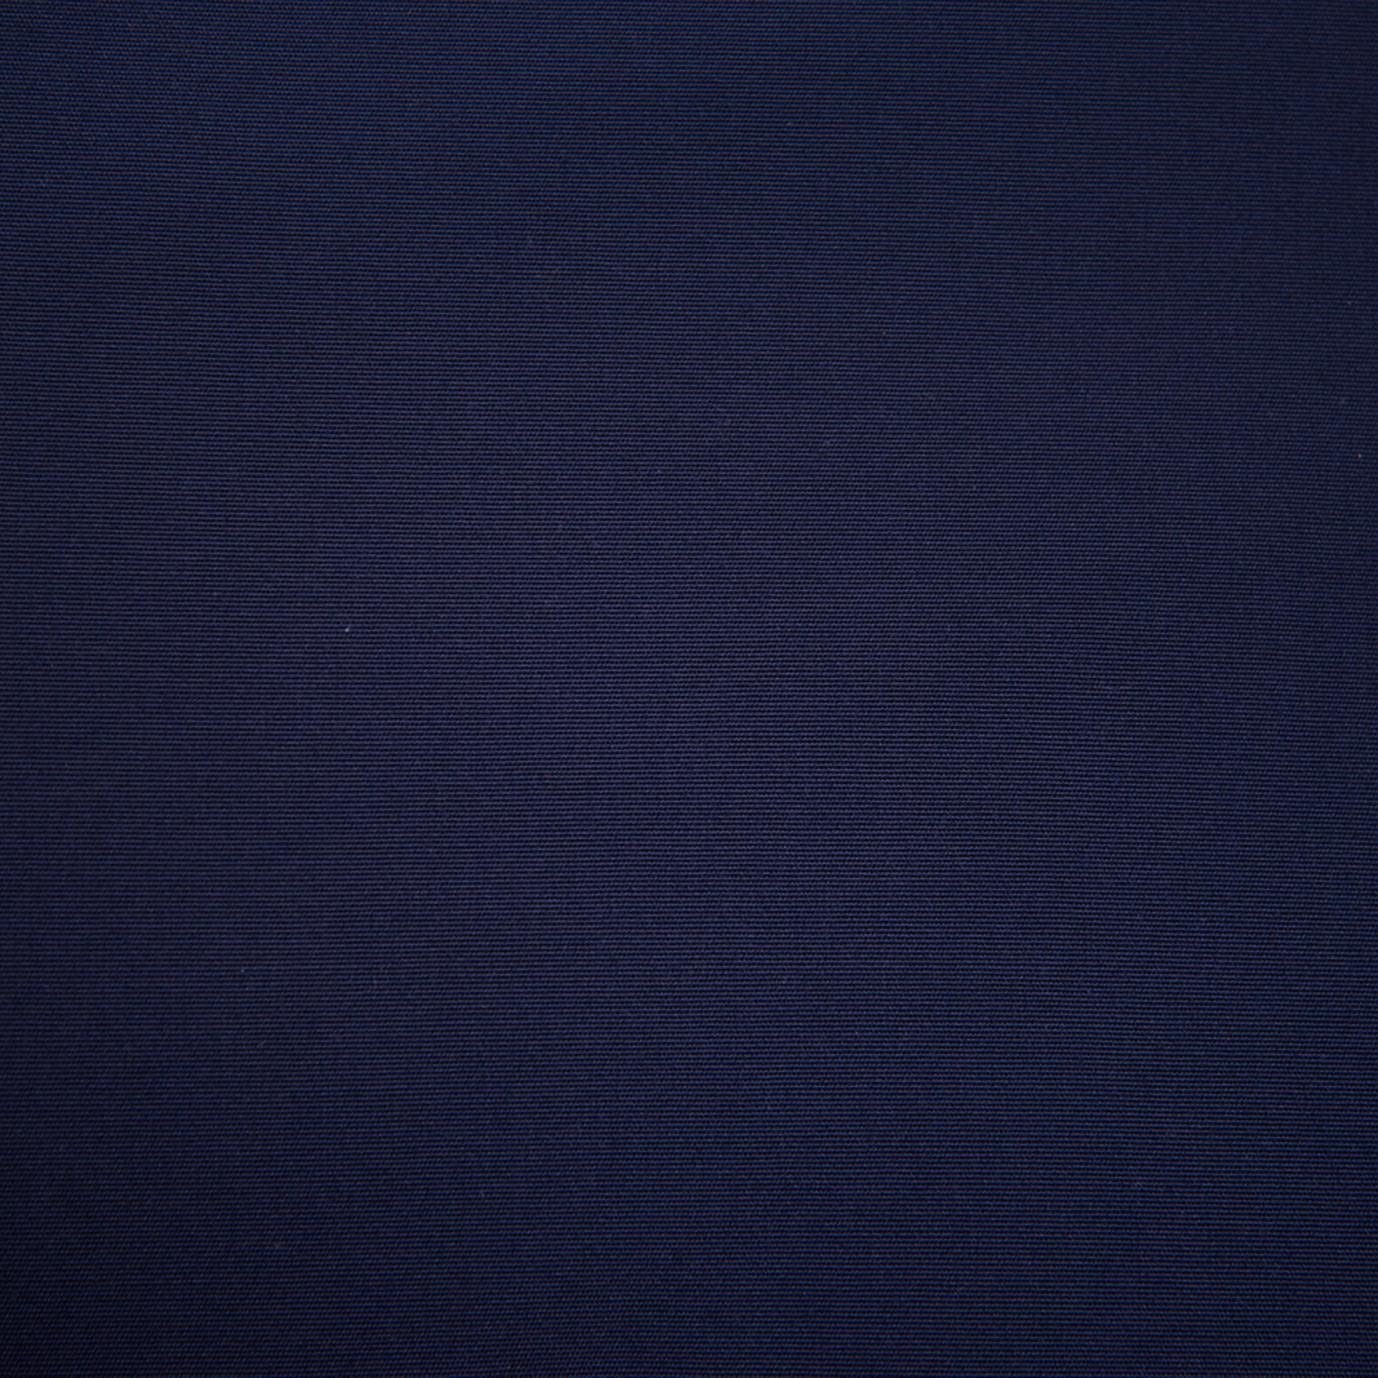 Barcelo™ 5 Piece Motion Club & Ottoman Set - Navy Blue